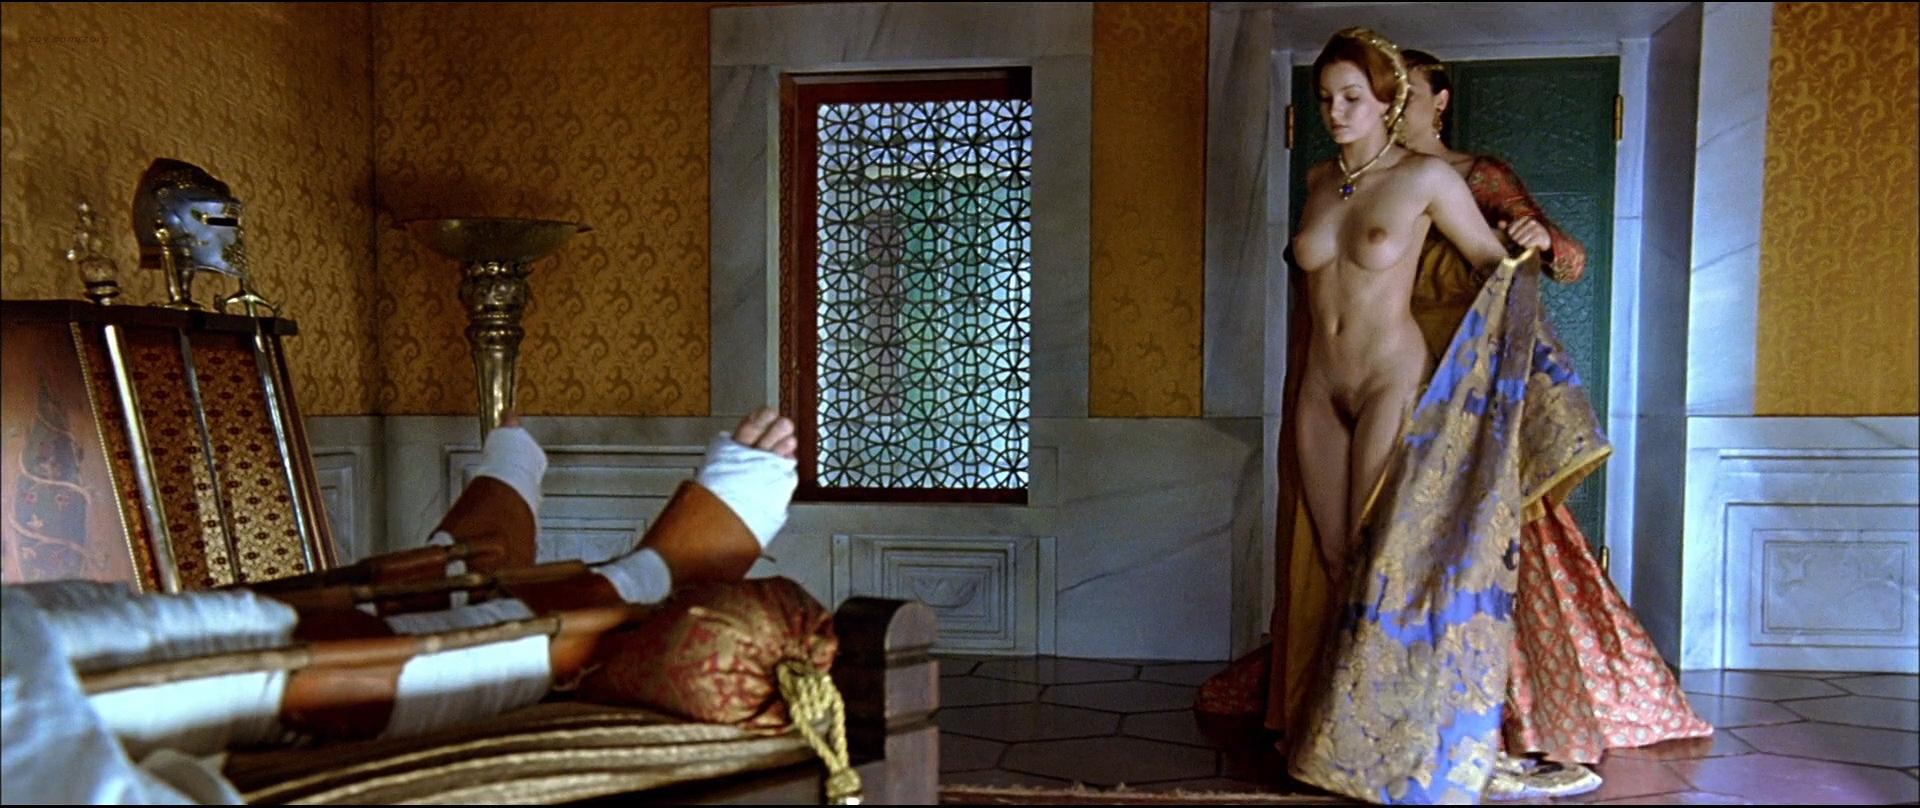 porno-kino-iz-filmov-smotret-porno-dikoe-porevo-lesbiyanok-na-krovati